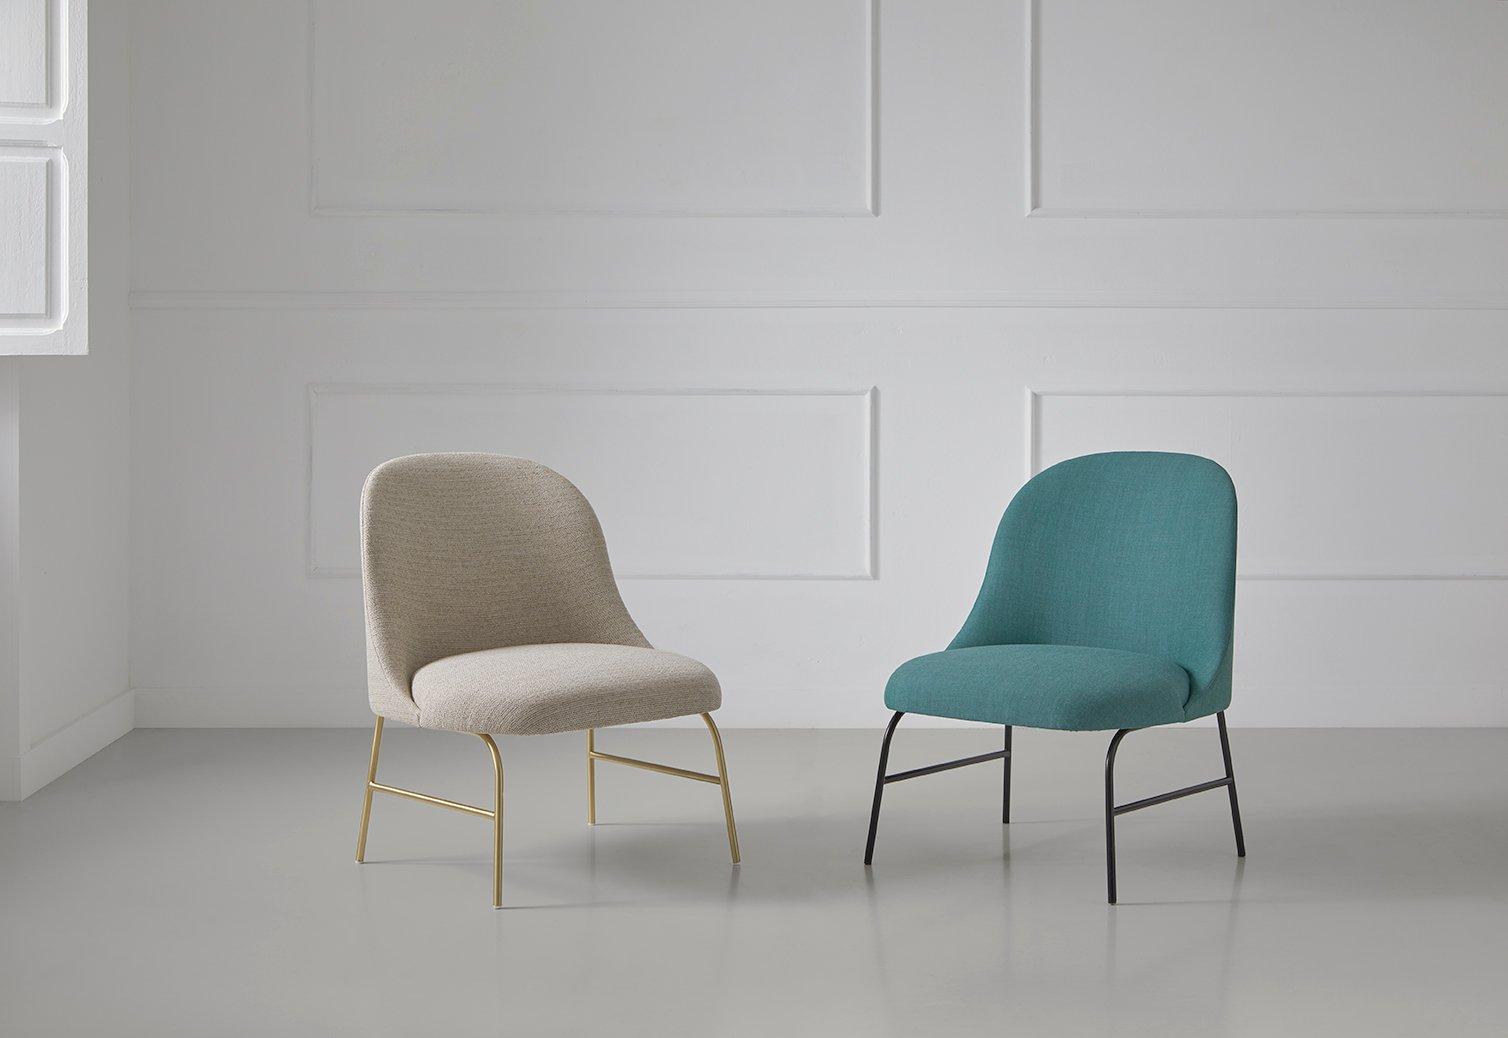 Butaca Aleta Lounge Chair; by Jaime Hayon